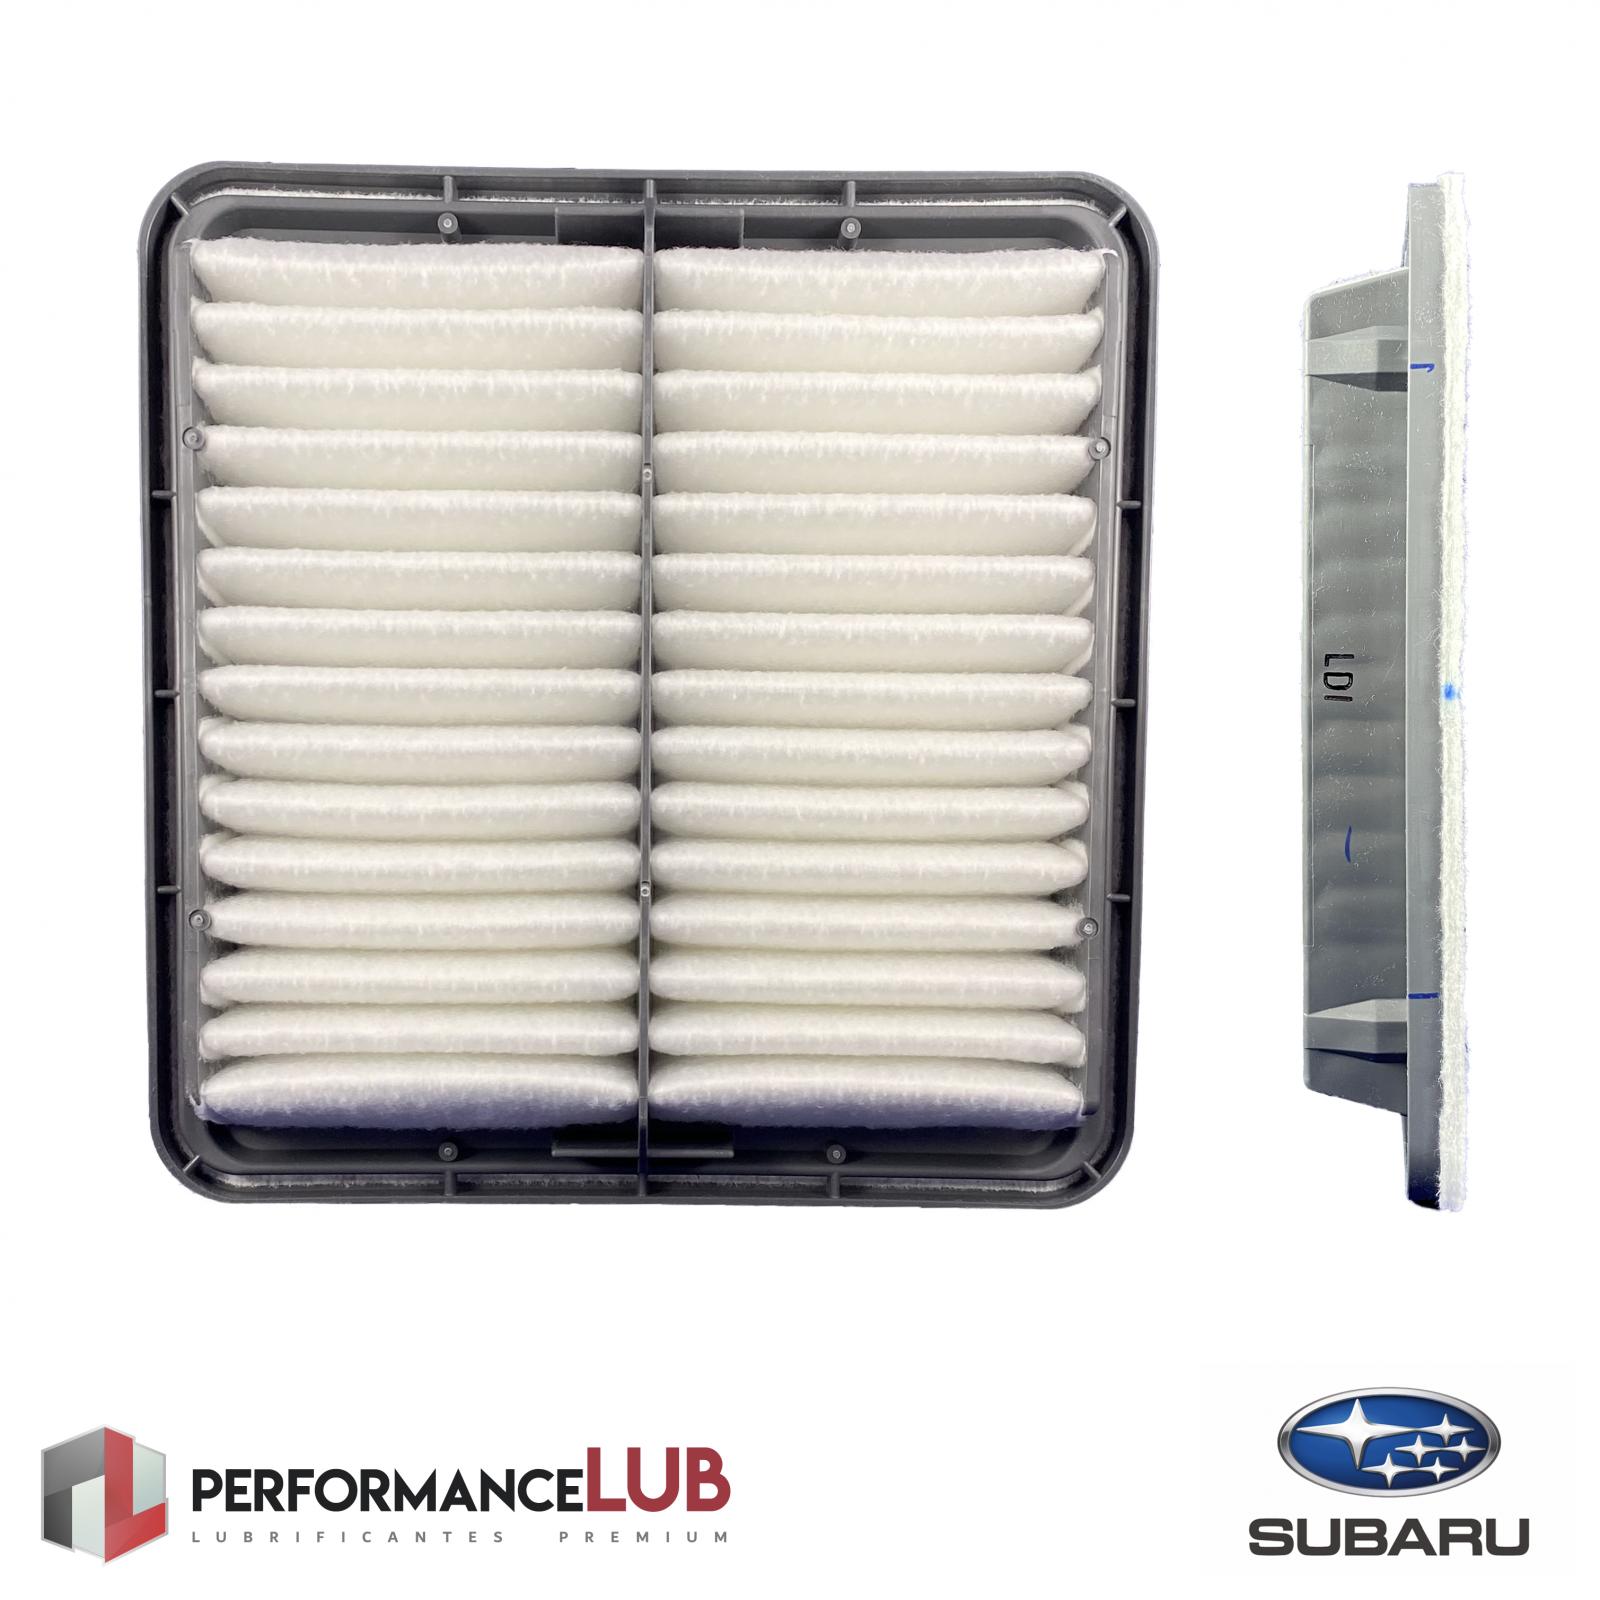 Filtro de ar do motor - Subaru - 16546AA120 - PerformanceLUB Lubrificantes Premium